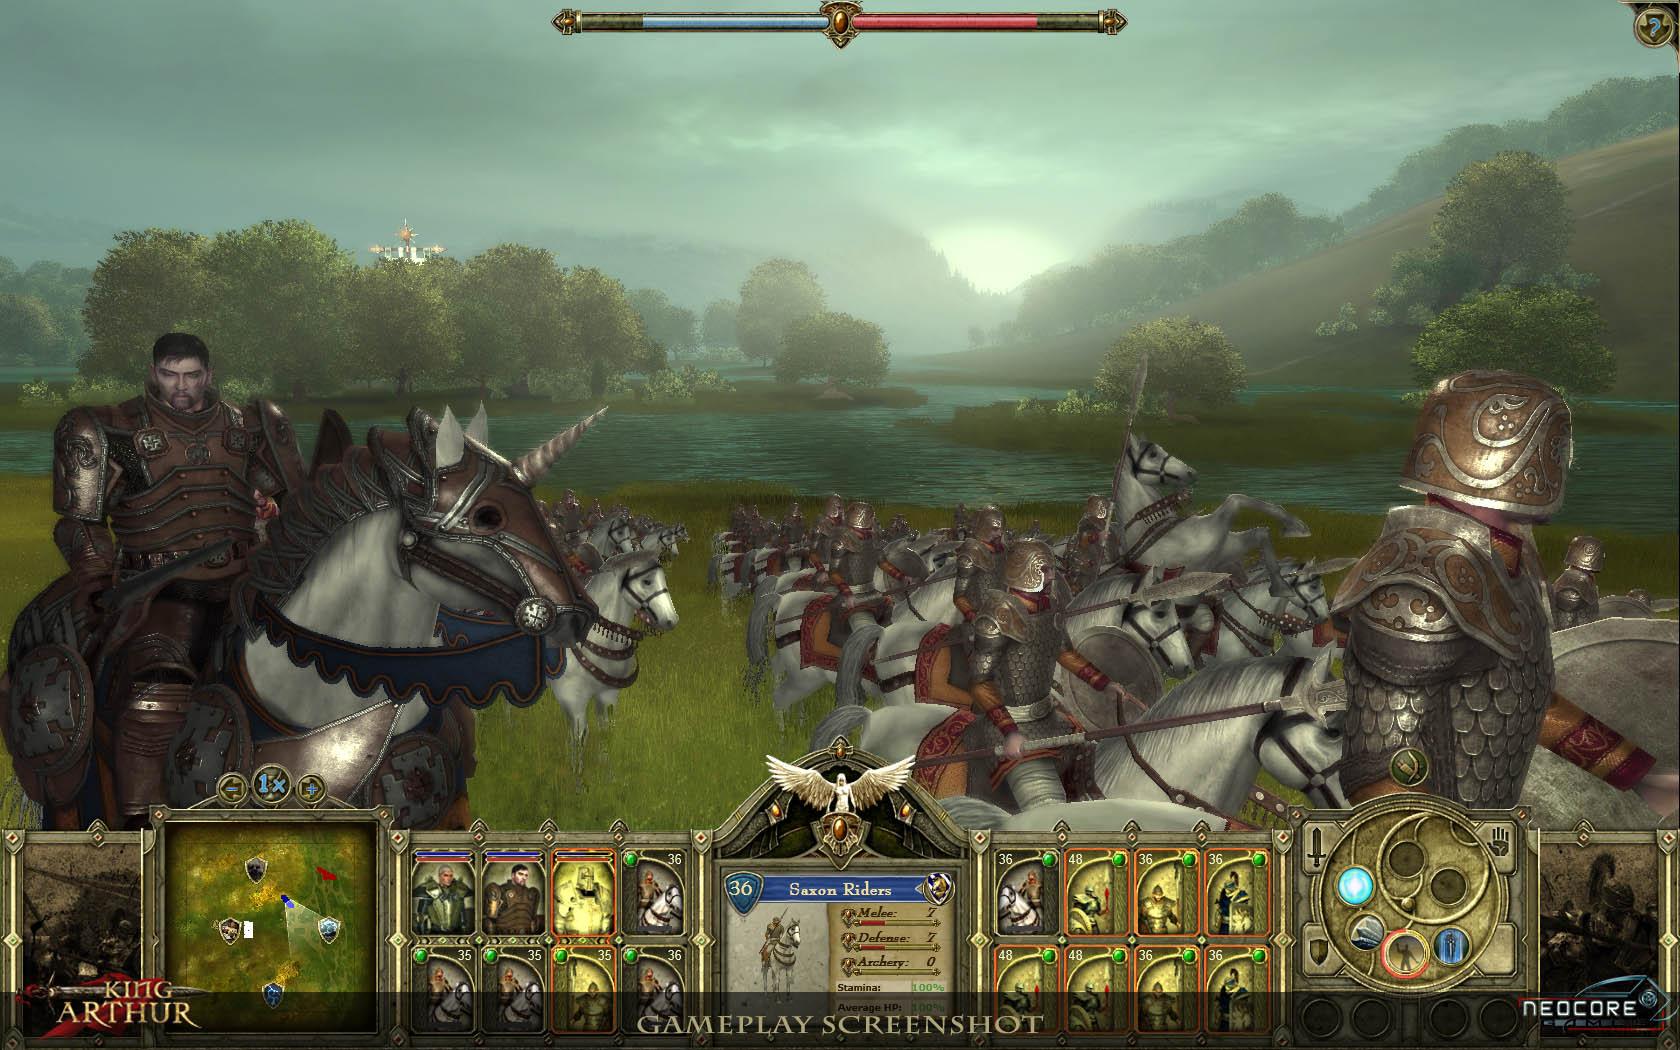 King Arthur: Knights and Vassals DLC screenshot